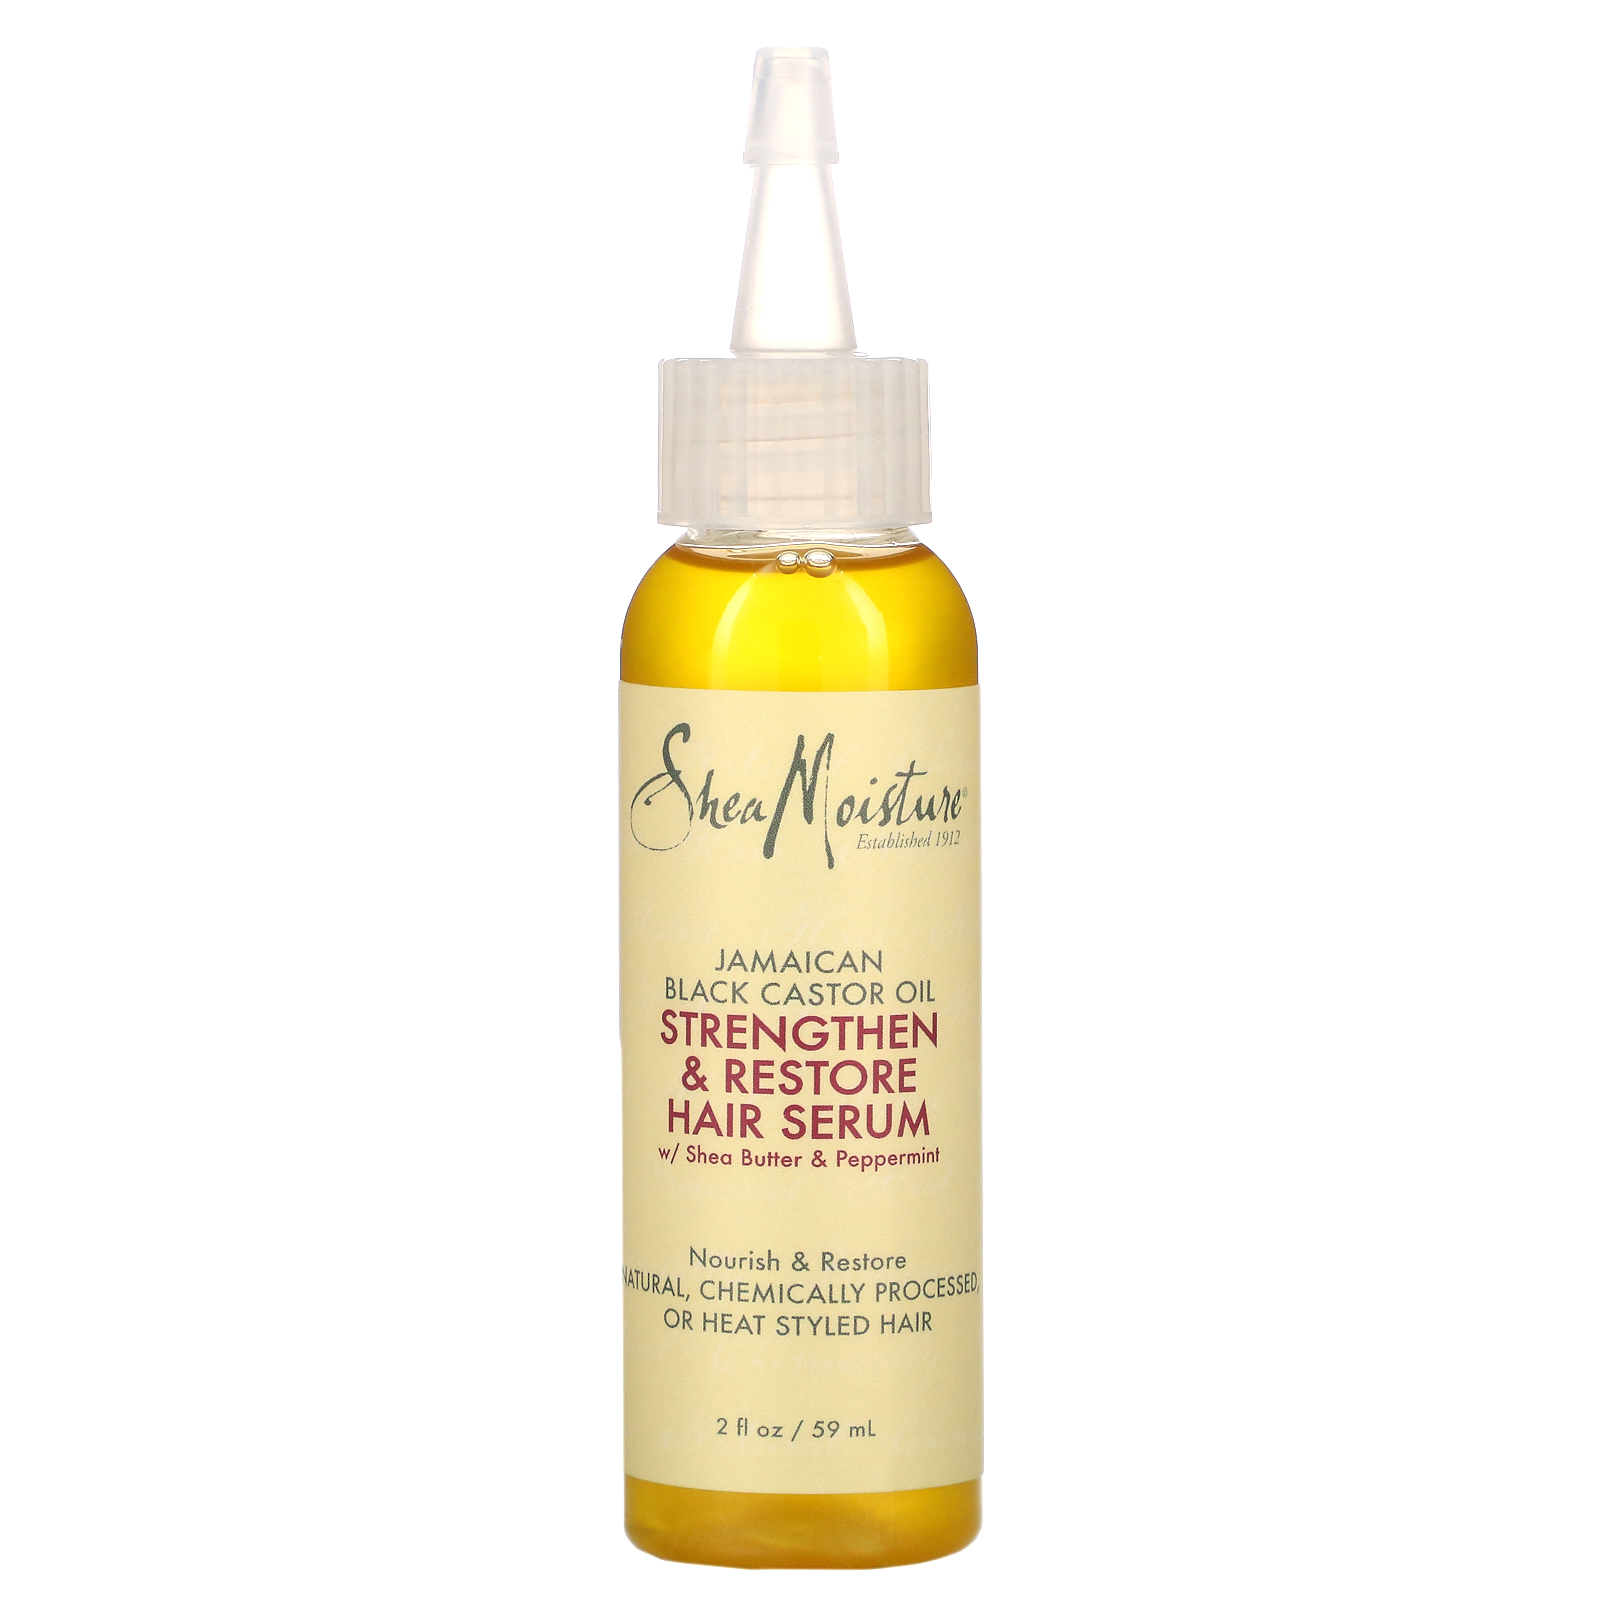 Sheamoisture Jamaican Black Castor Oil Strengthen Restore Hair Serum 2 Fl Oz 59 Ml Iherb